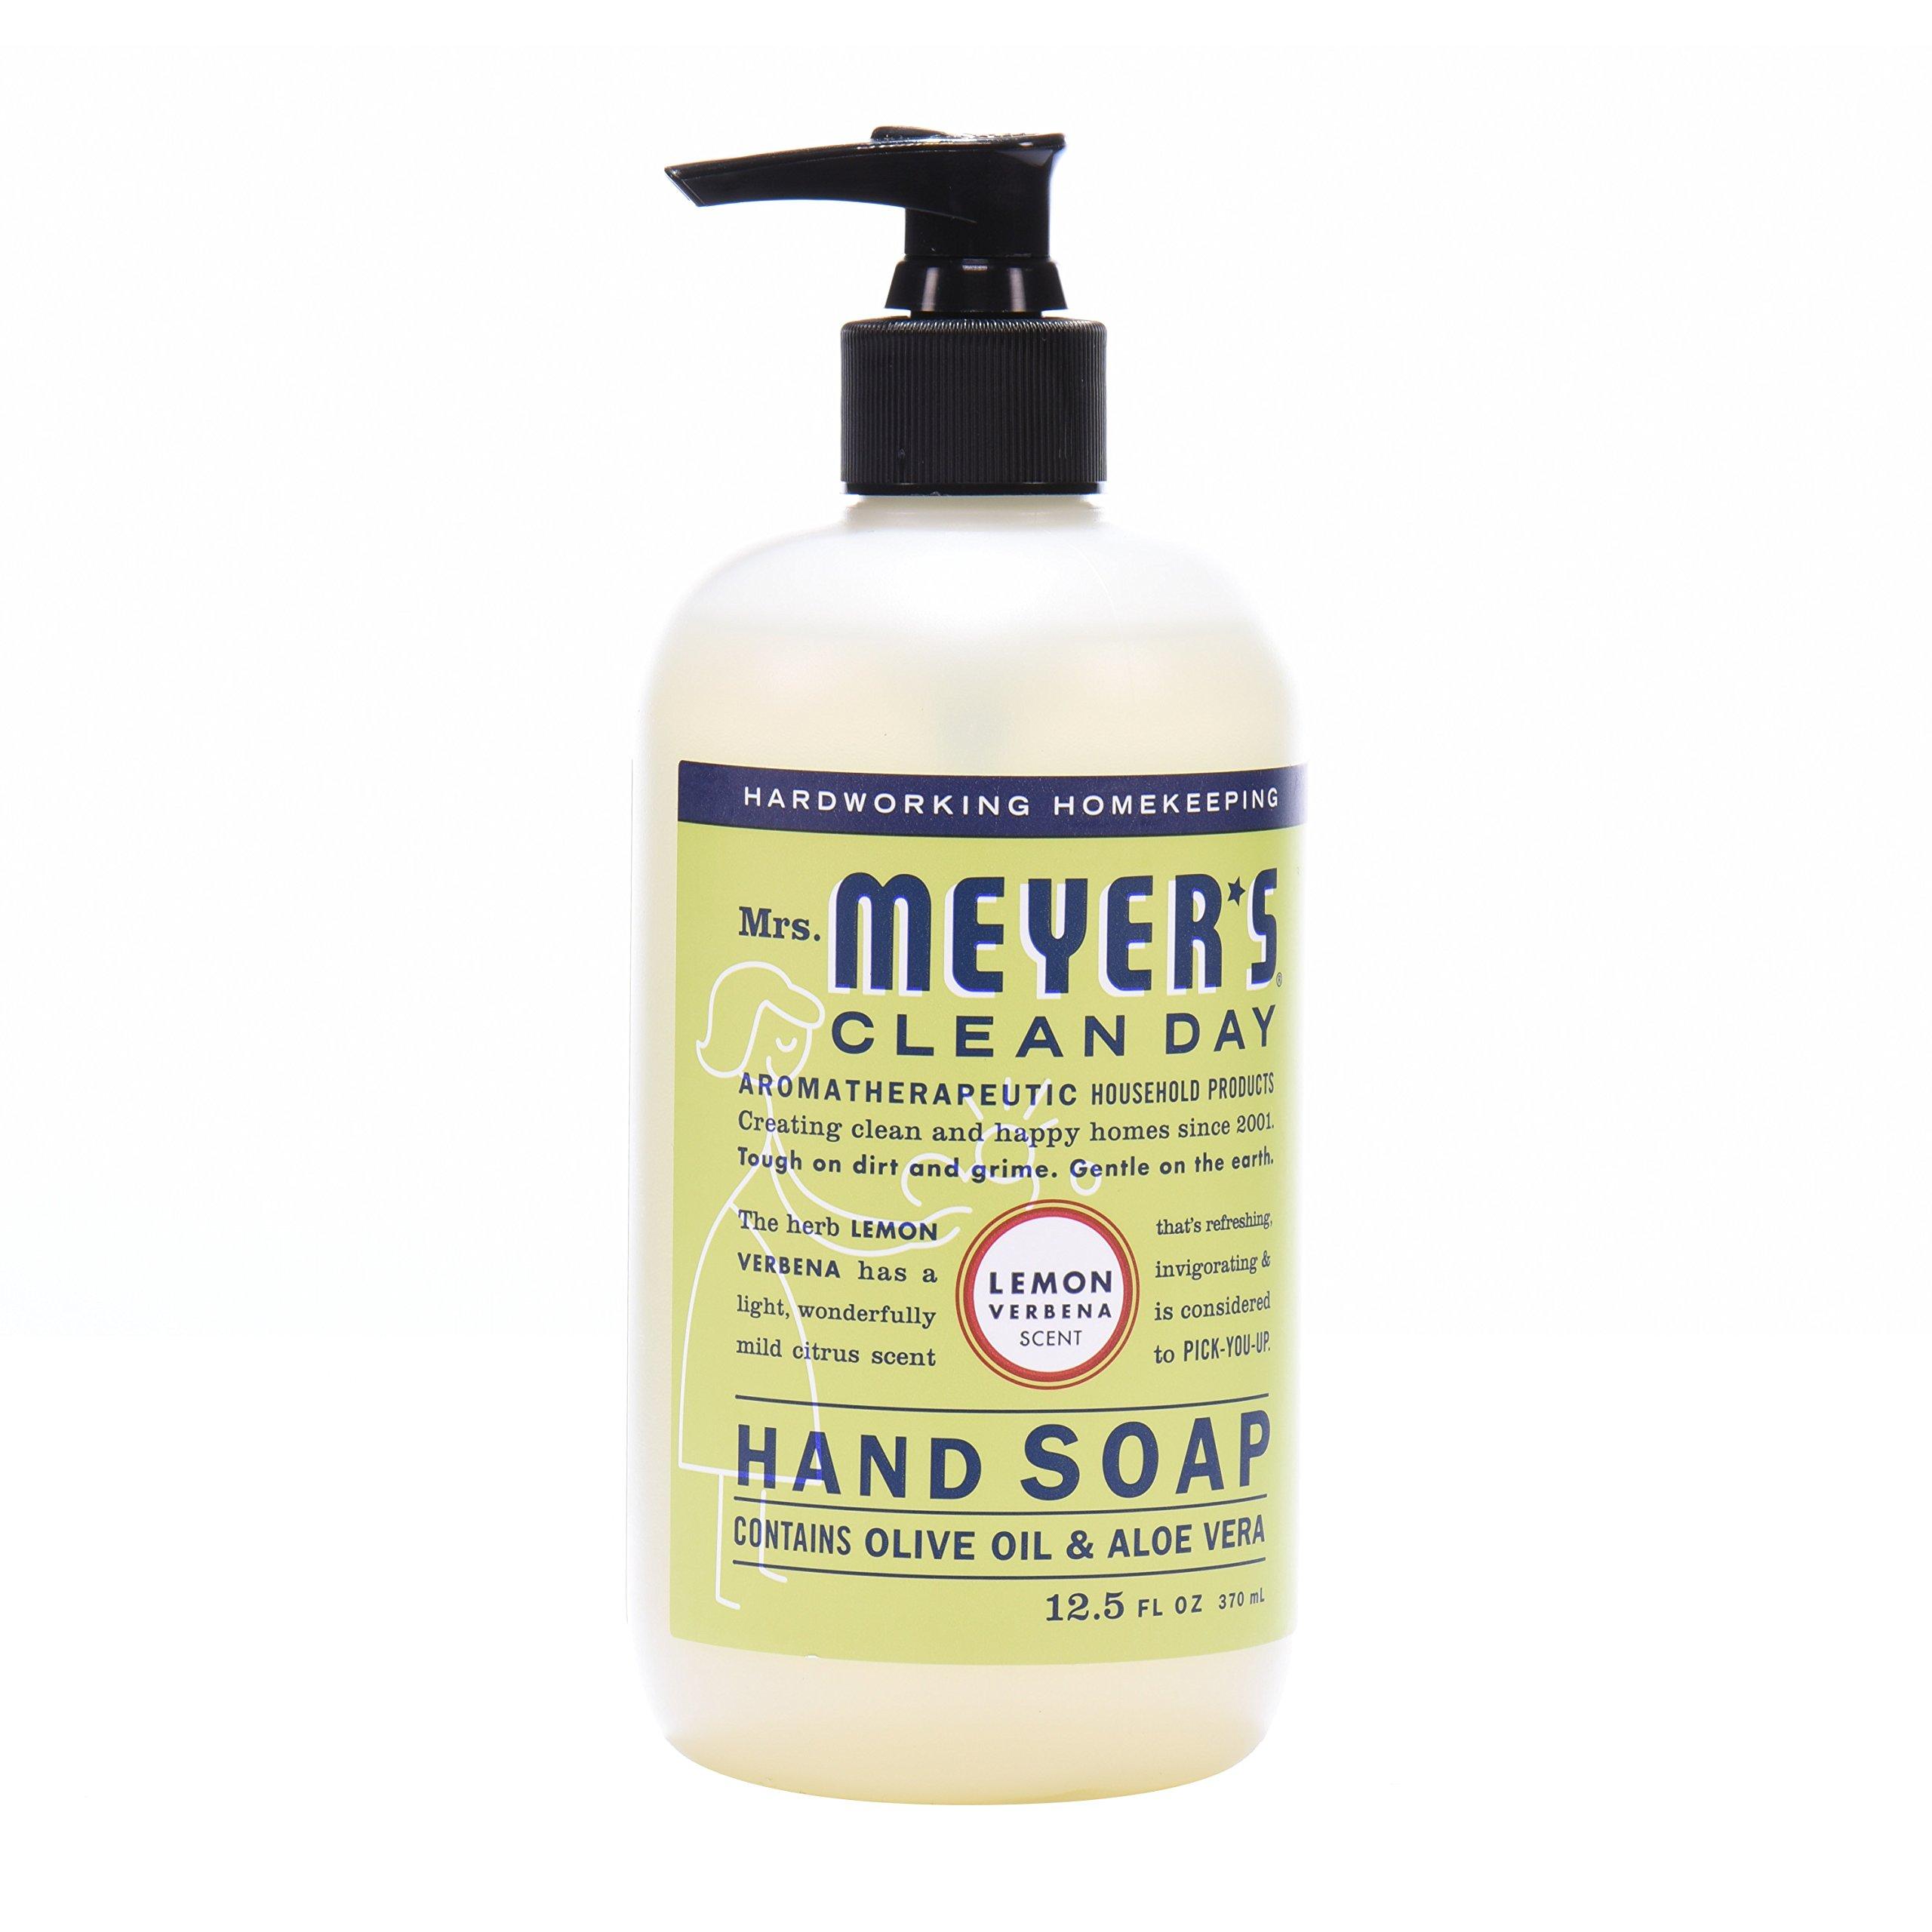 Mrs. Meyer's Clean Day Kitchen Basics Set, Lemon Verbena, 3 ct: Dish Soap (16 fl oz), Hand Soap (12.5 fl oz), Multi-Surface Everyday Cleaner (16 fl oz) by Mrs. Meyer's Clean Day (Image #7)